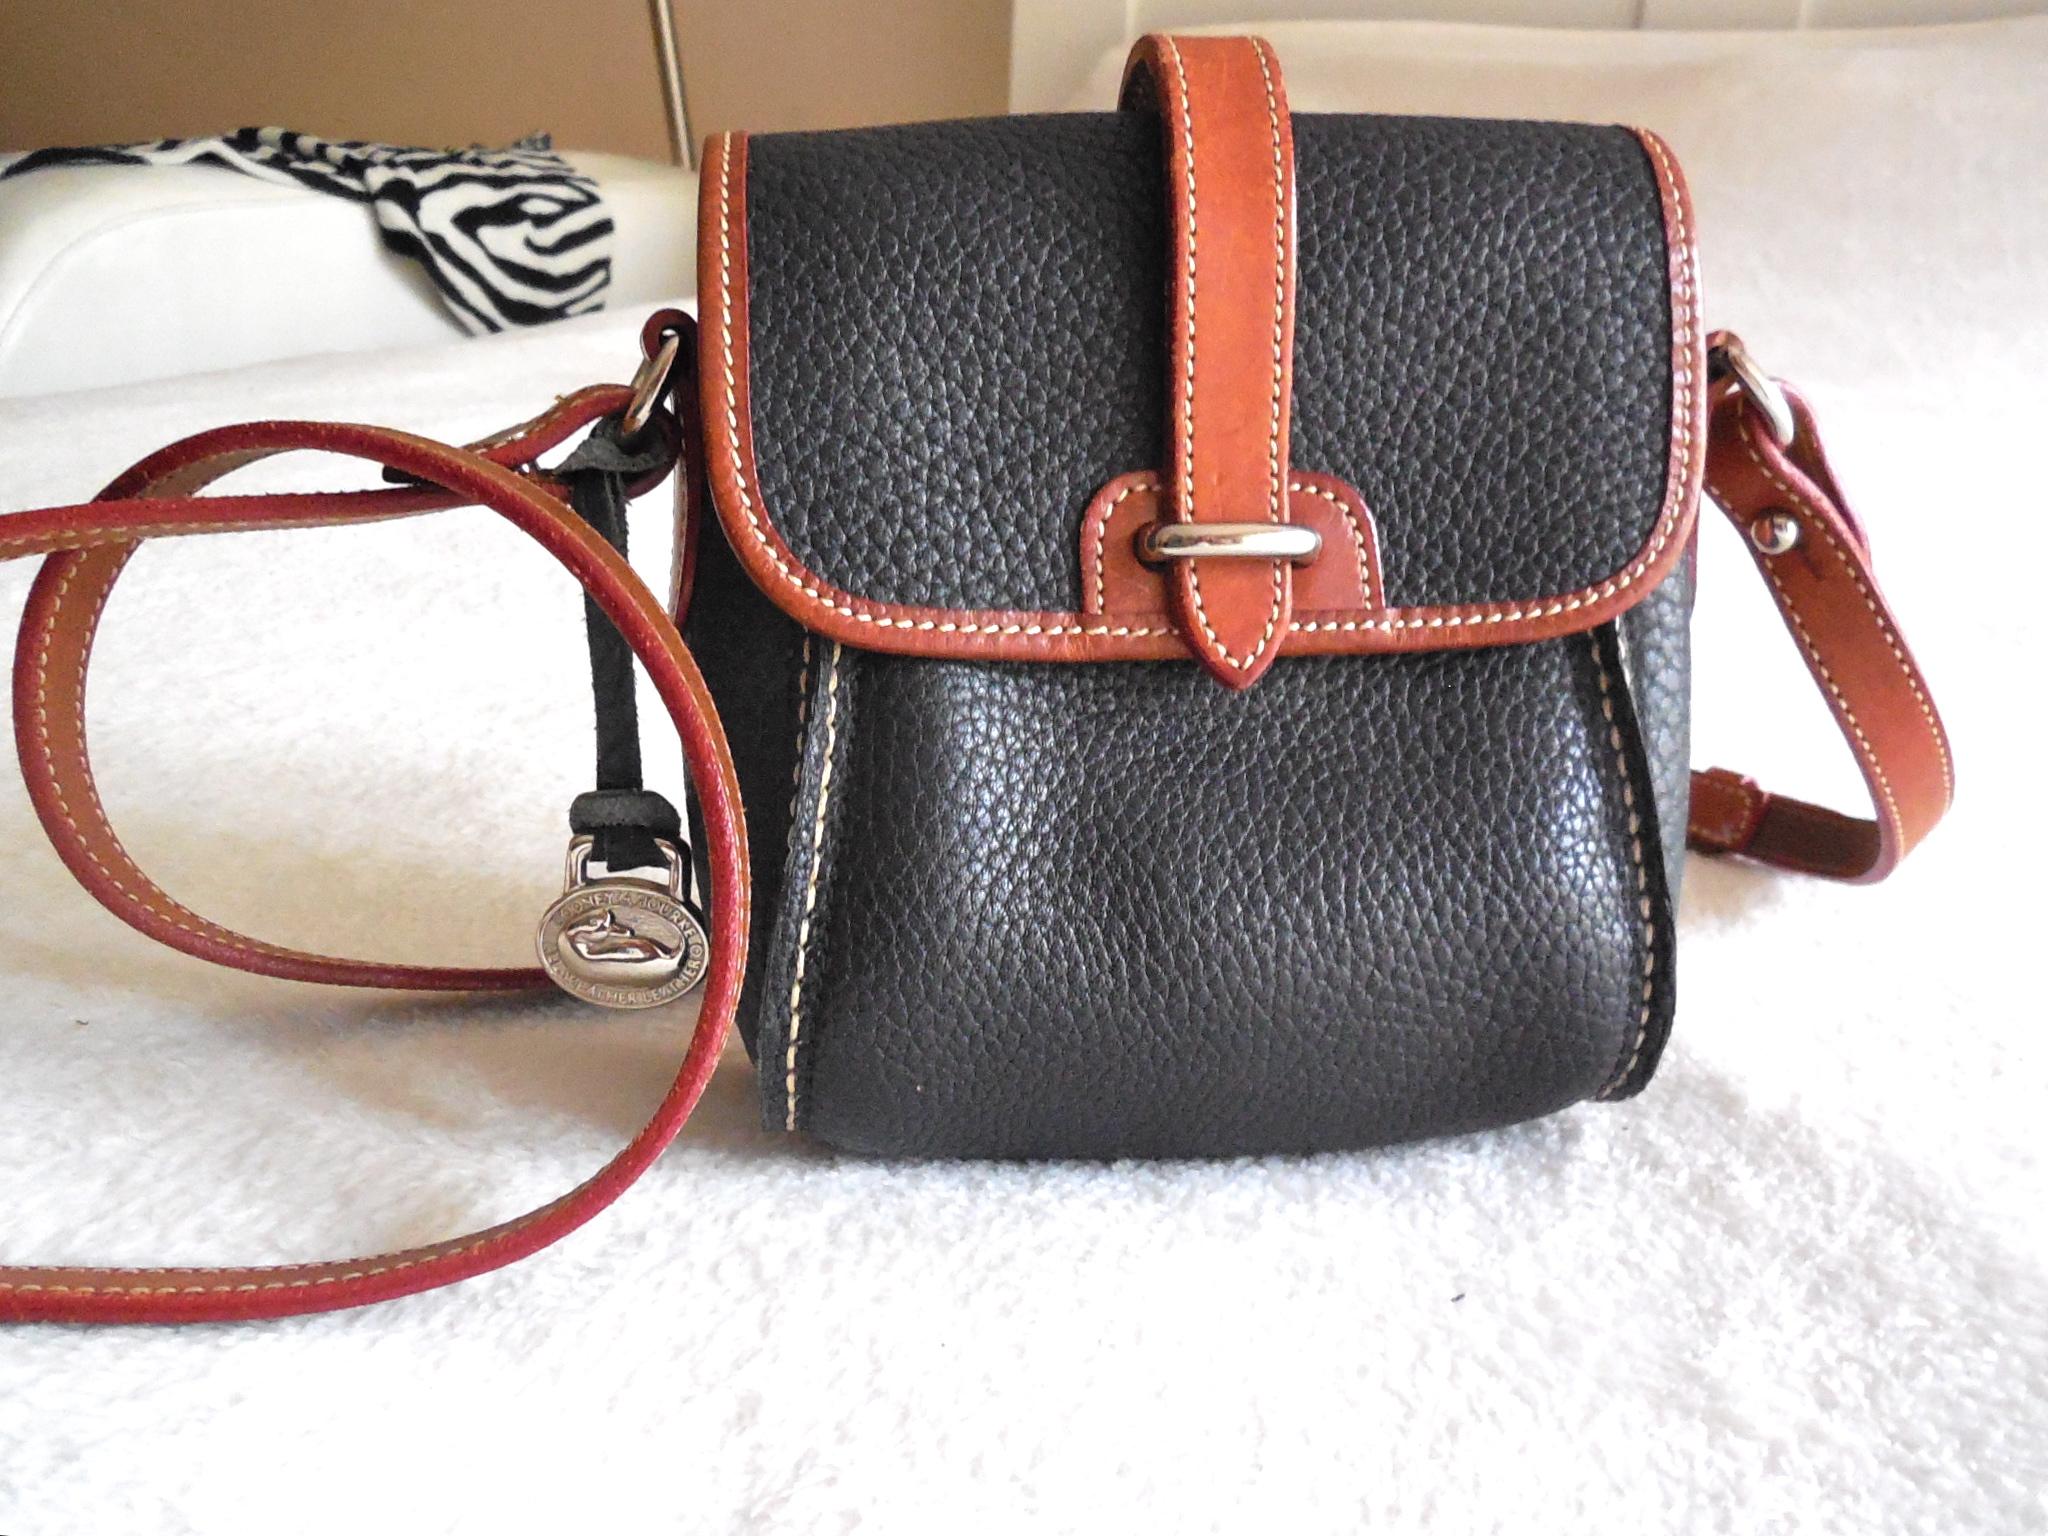 1f0b3b18e Dooney & Bourke Vintage Mini Crossbody Bag - Luxurylana Boutique